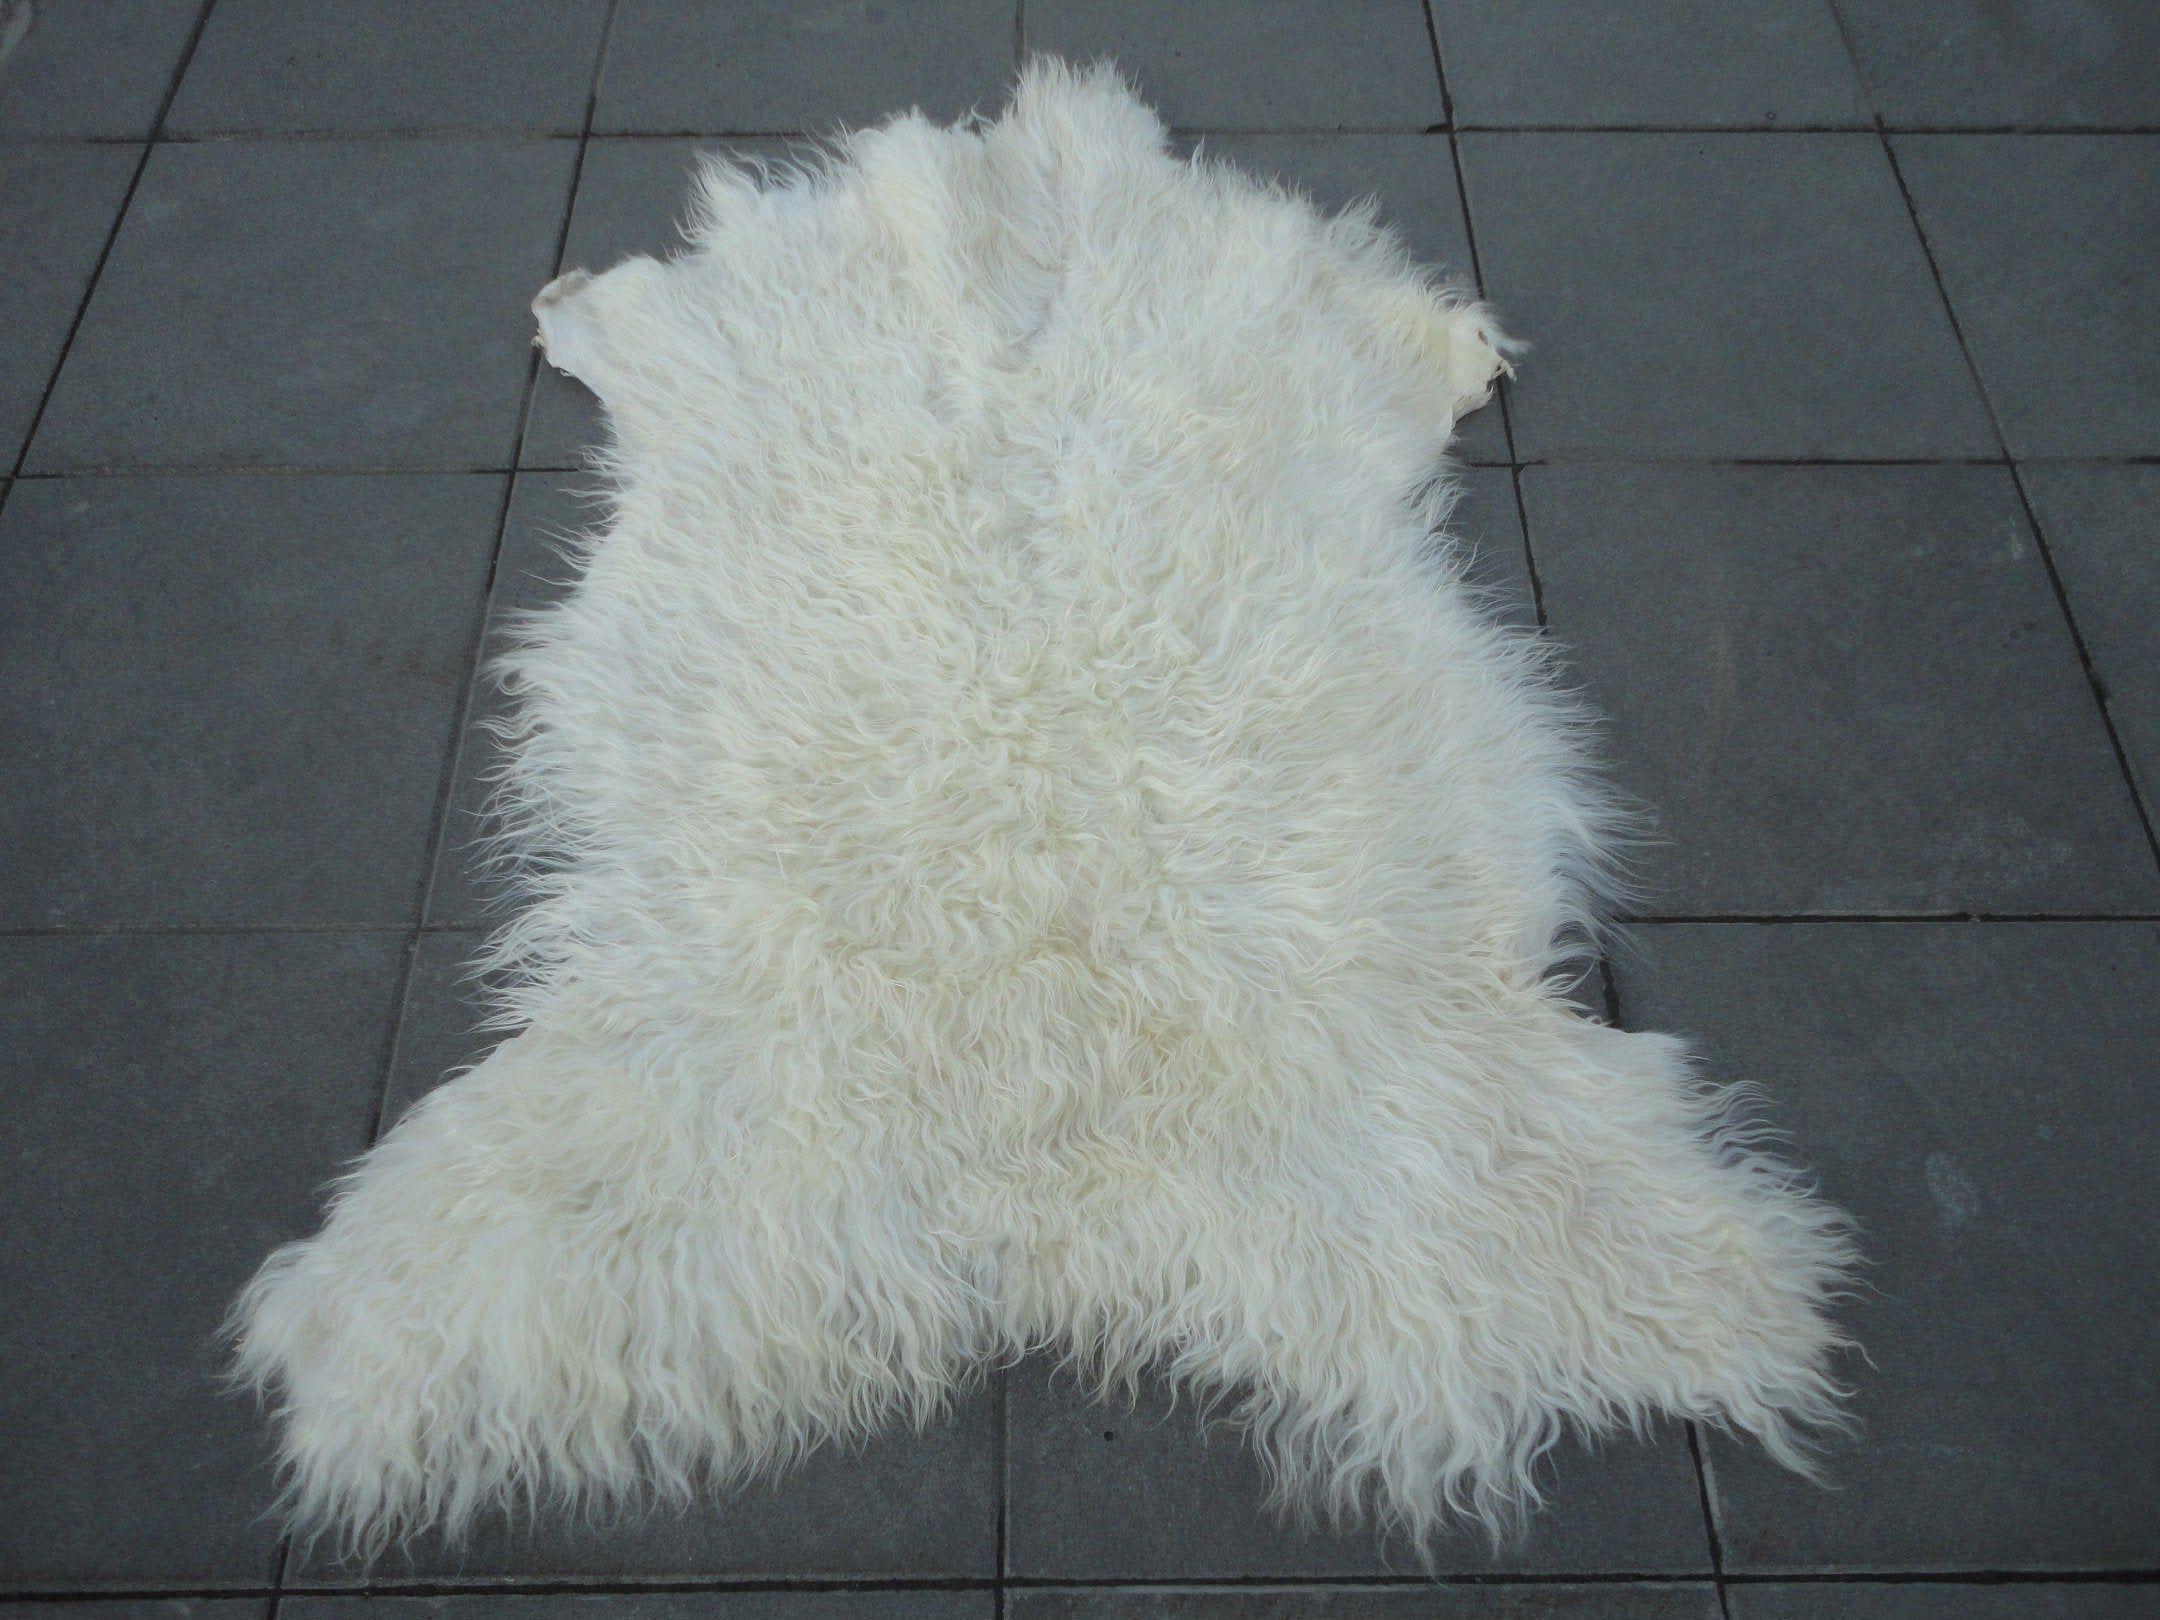 organic goat skin natural cozy pet bed goatskin pelt office floor carpet sofa seat cover 3 8 x 3 goat throw bio f hayvan derisi hali evcil hayvanlar hayvan